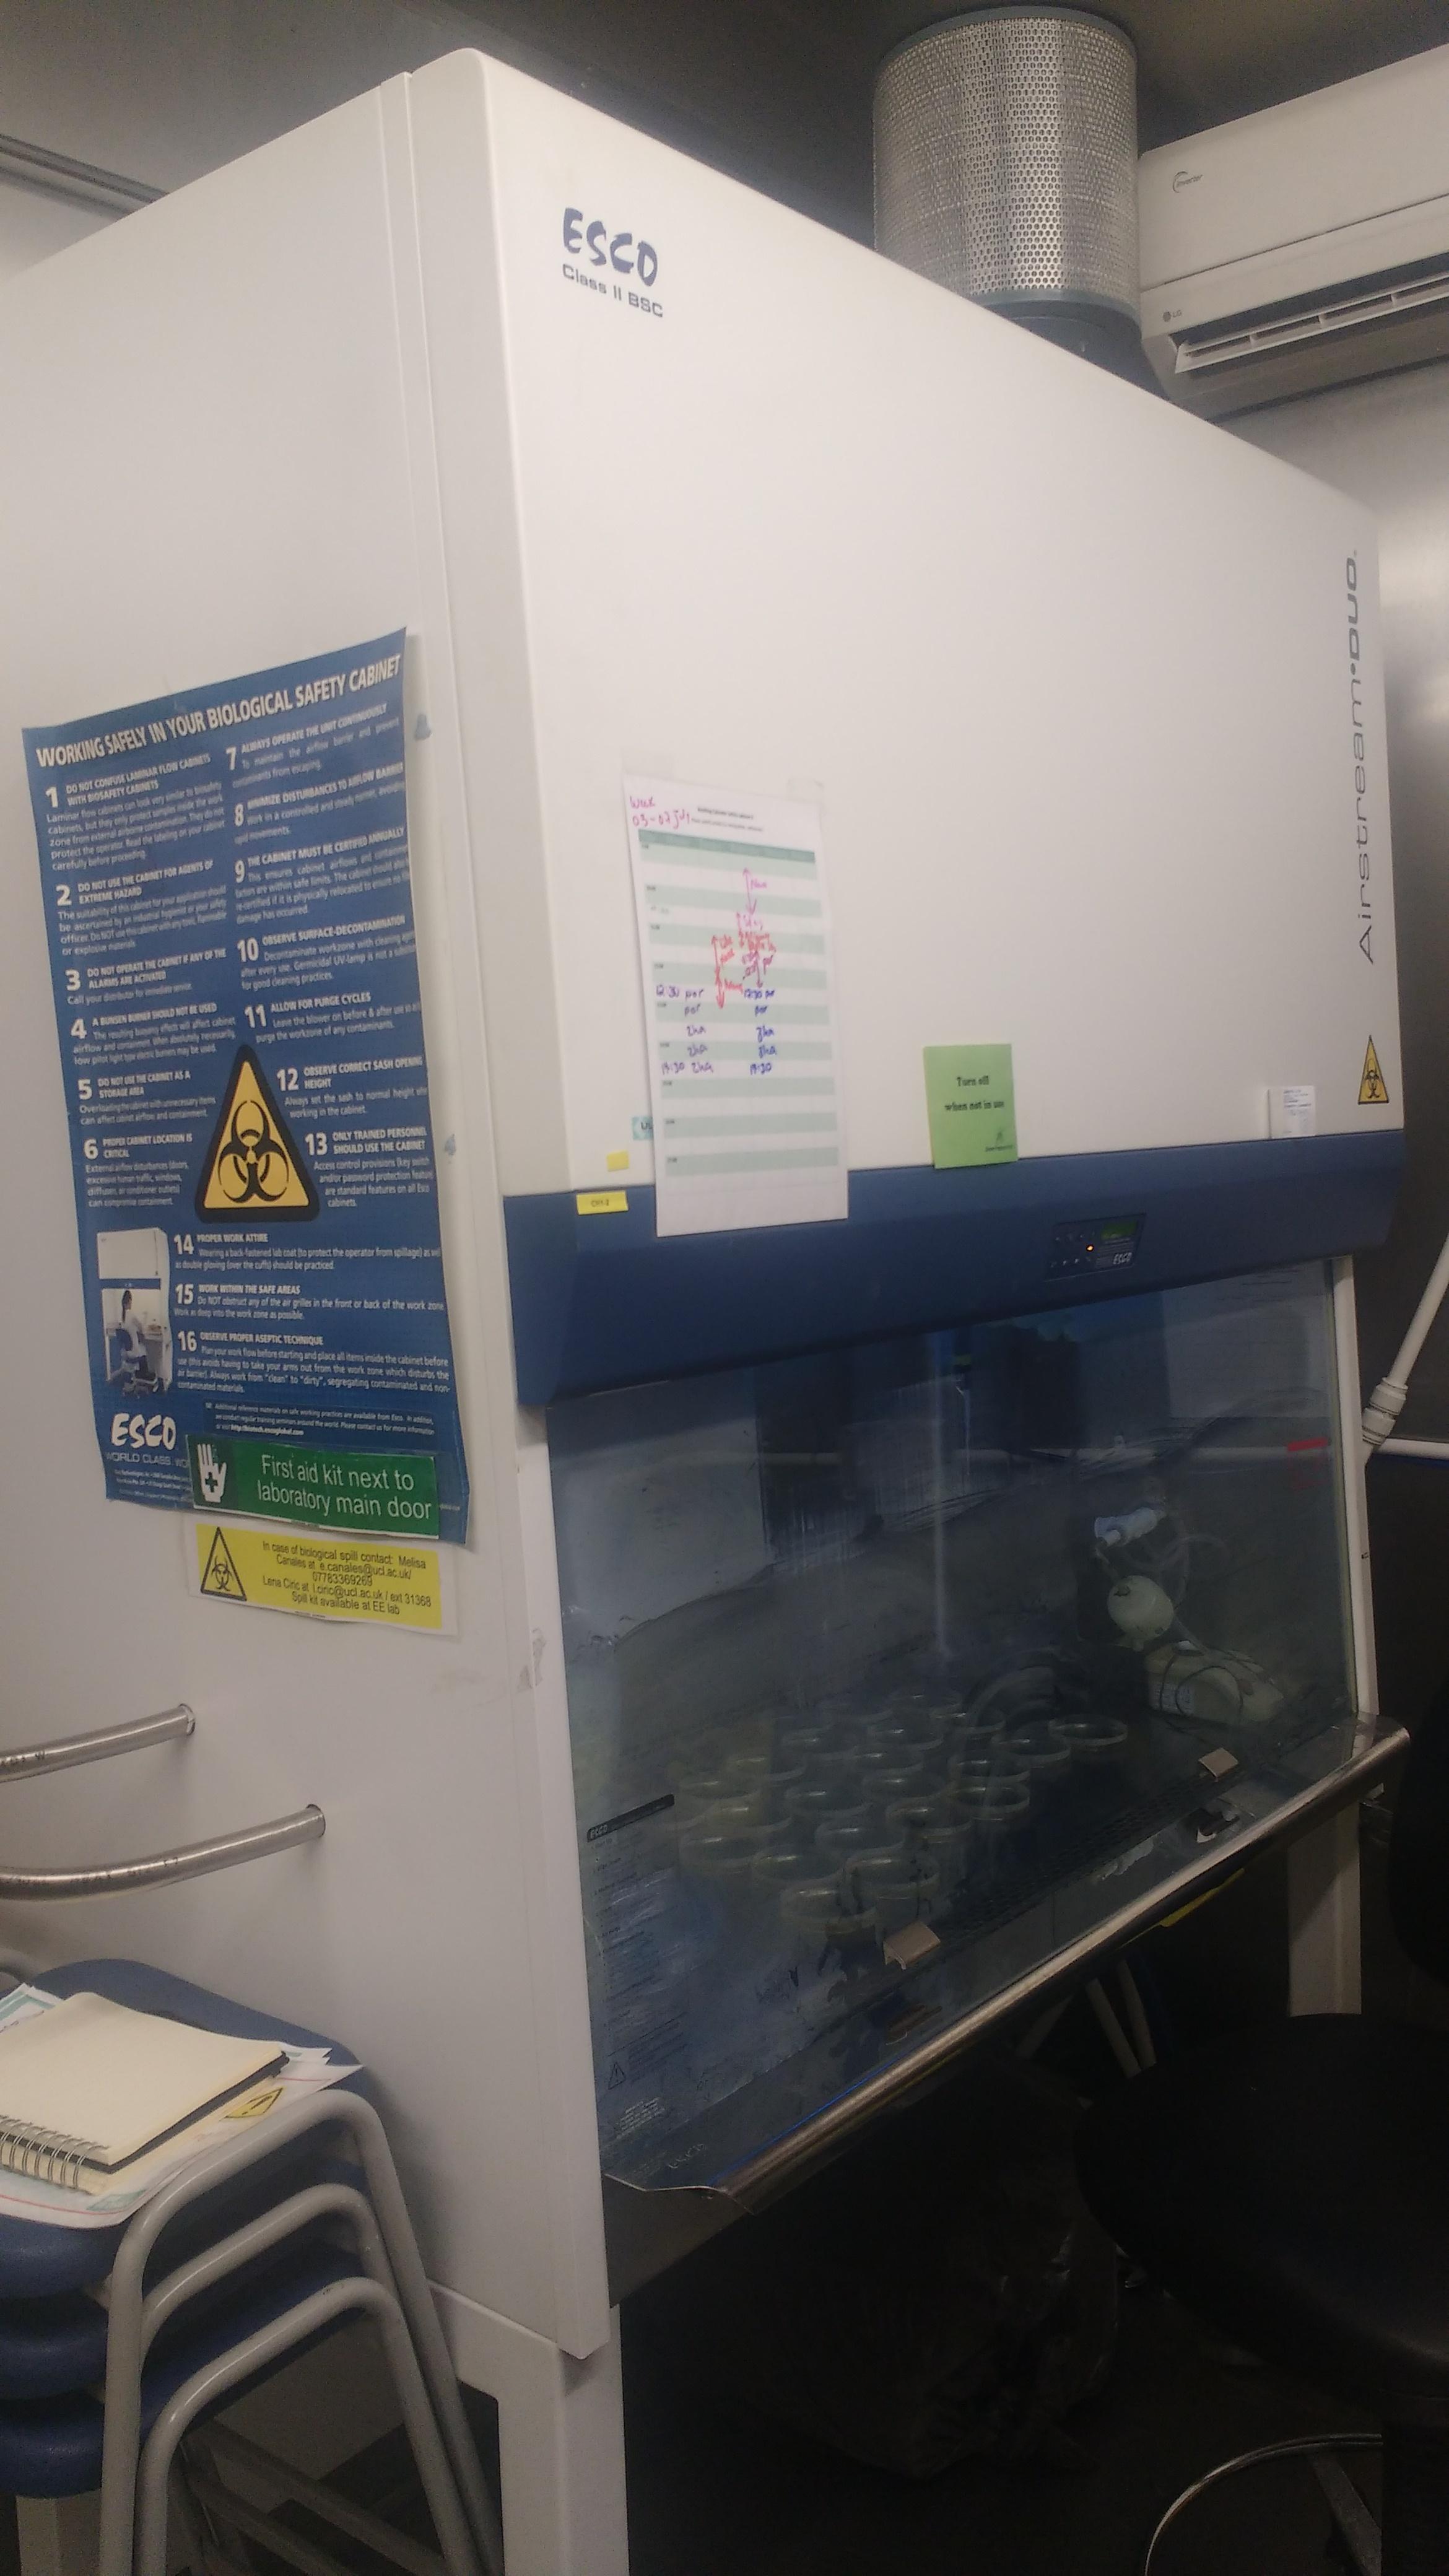 Biosafety cabinet Level II Esco AC2-4D1 CLII